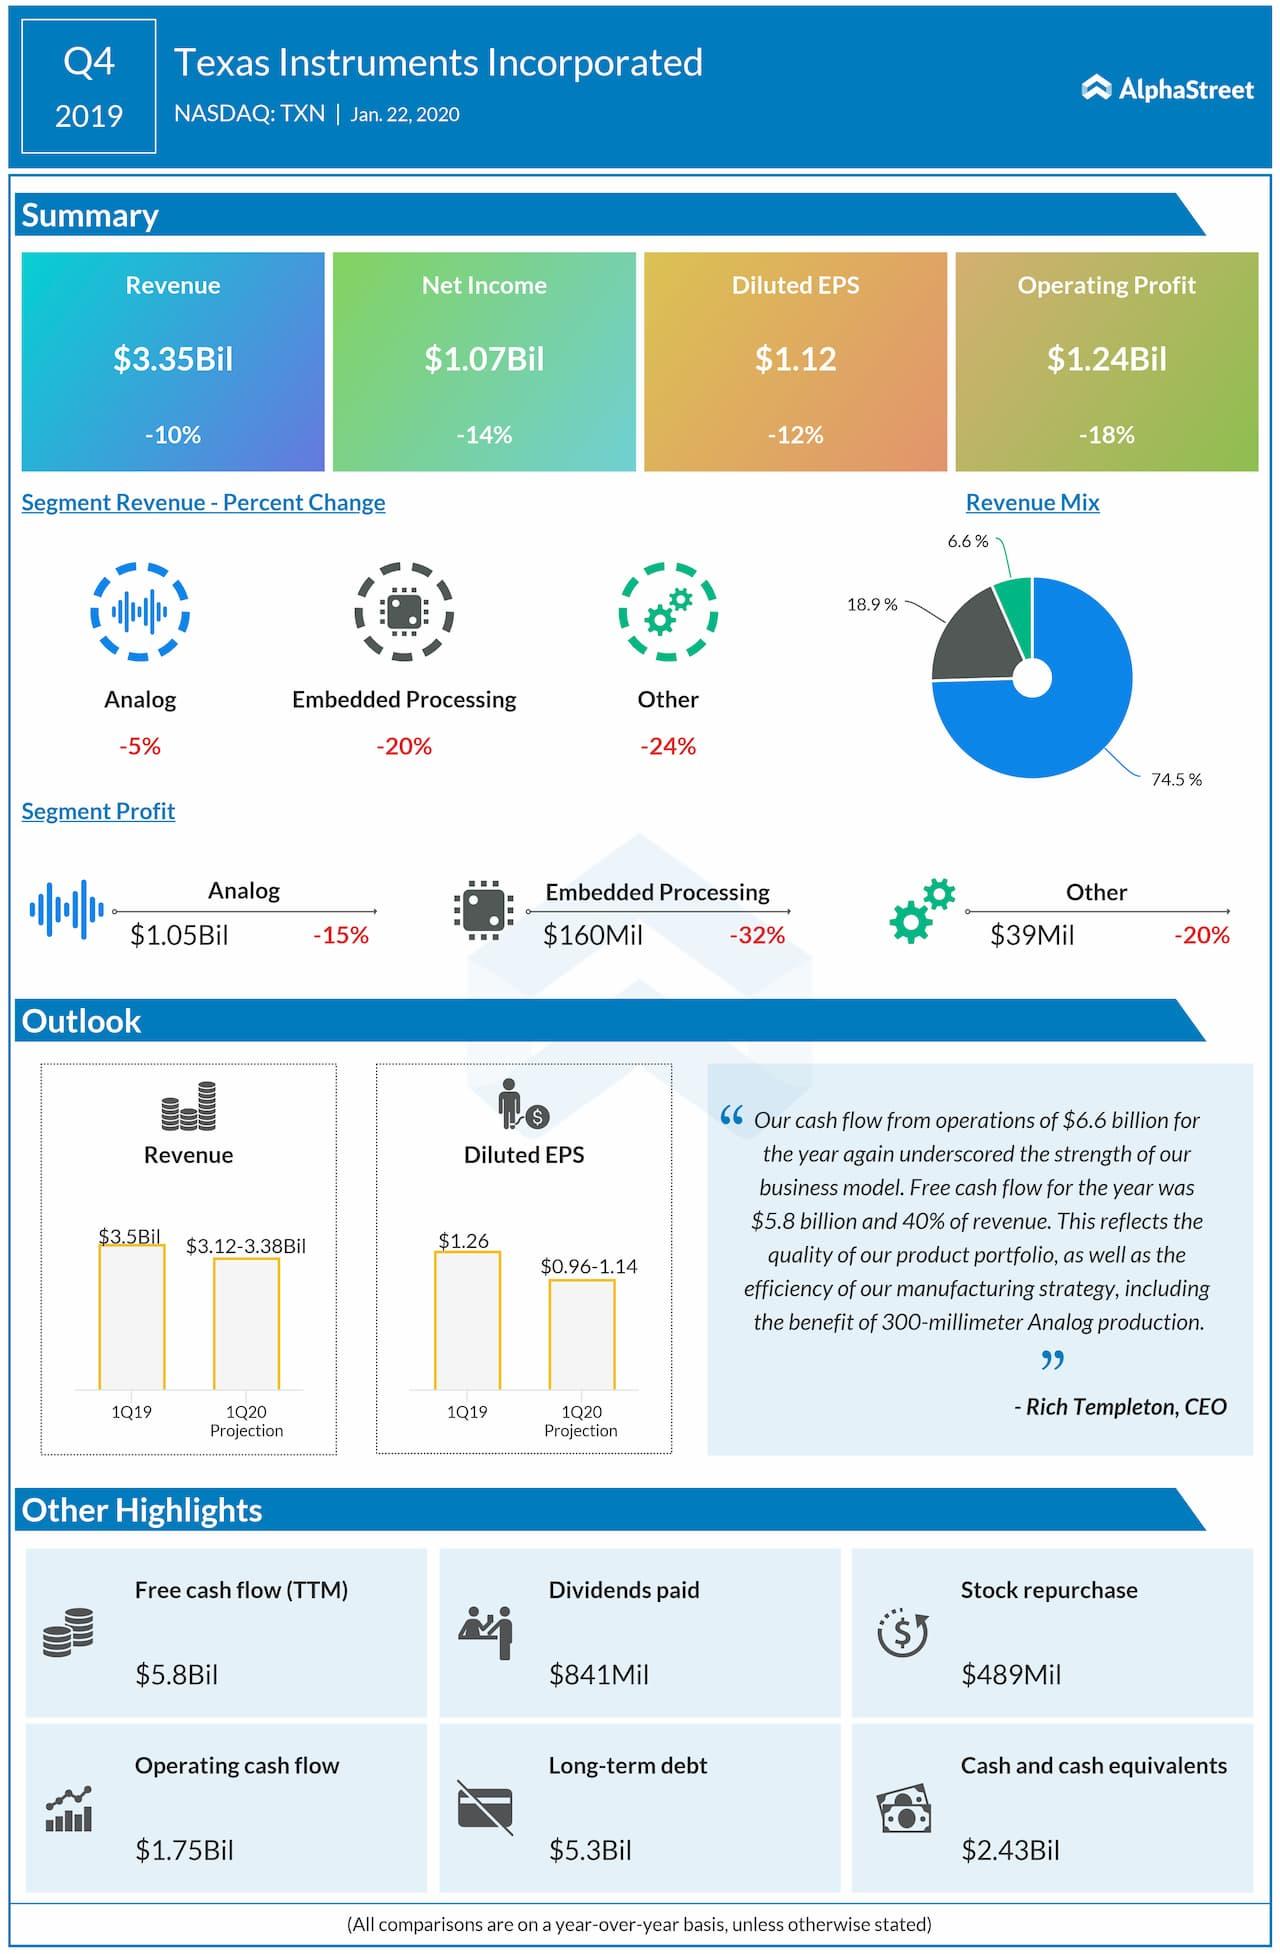 Texas Instruments beats Q4 2019 revenue and earnings estimates